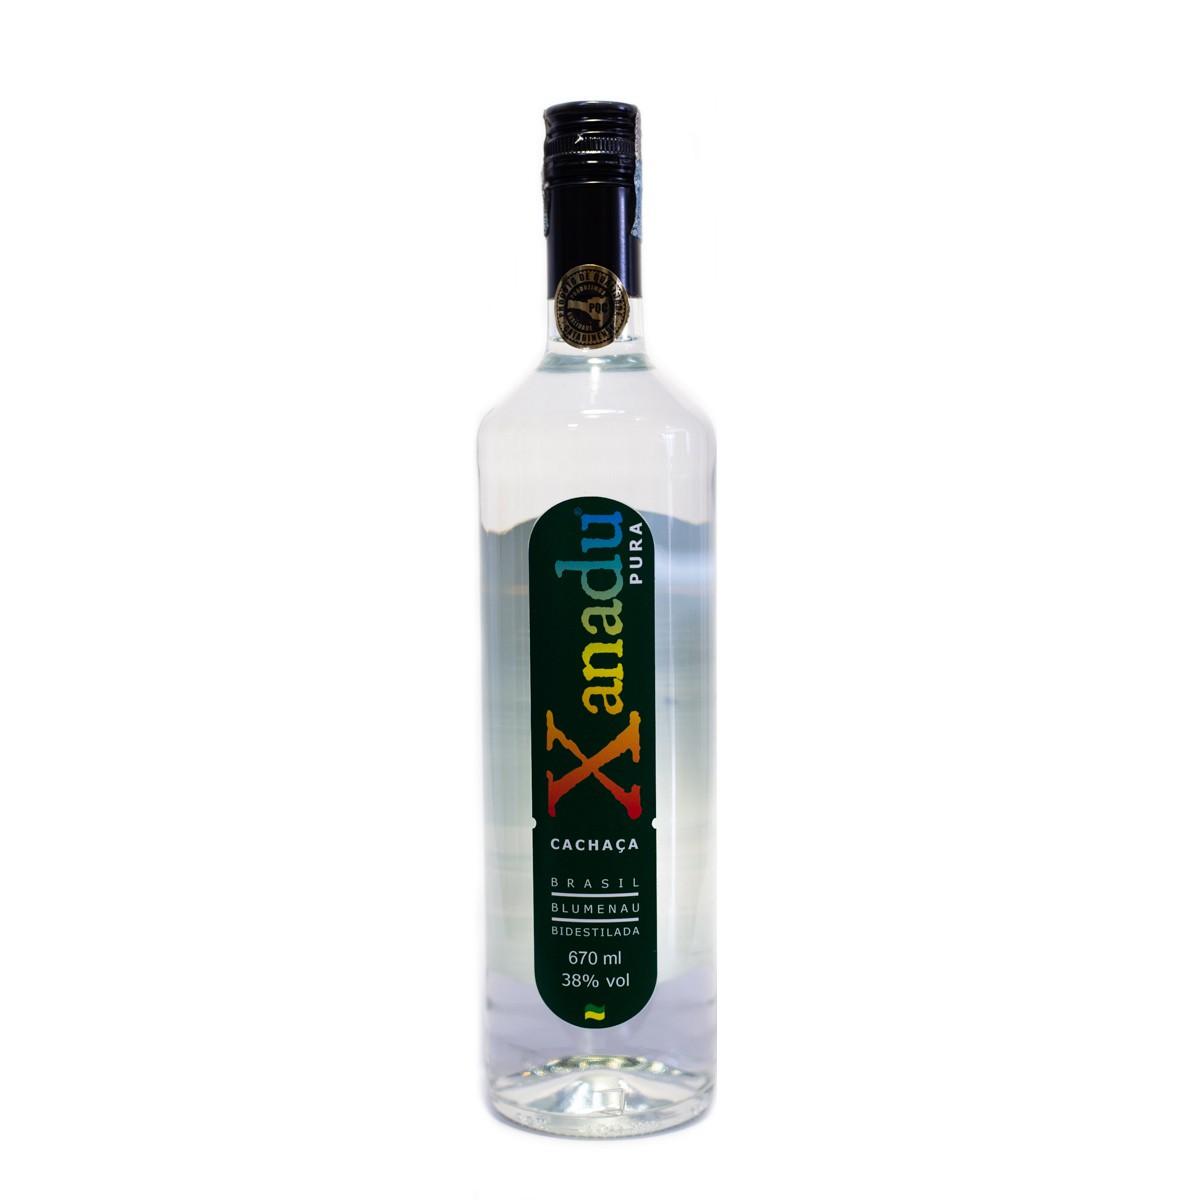 Cachaça Prata - Xanadu - 670 ml